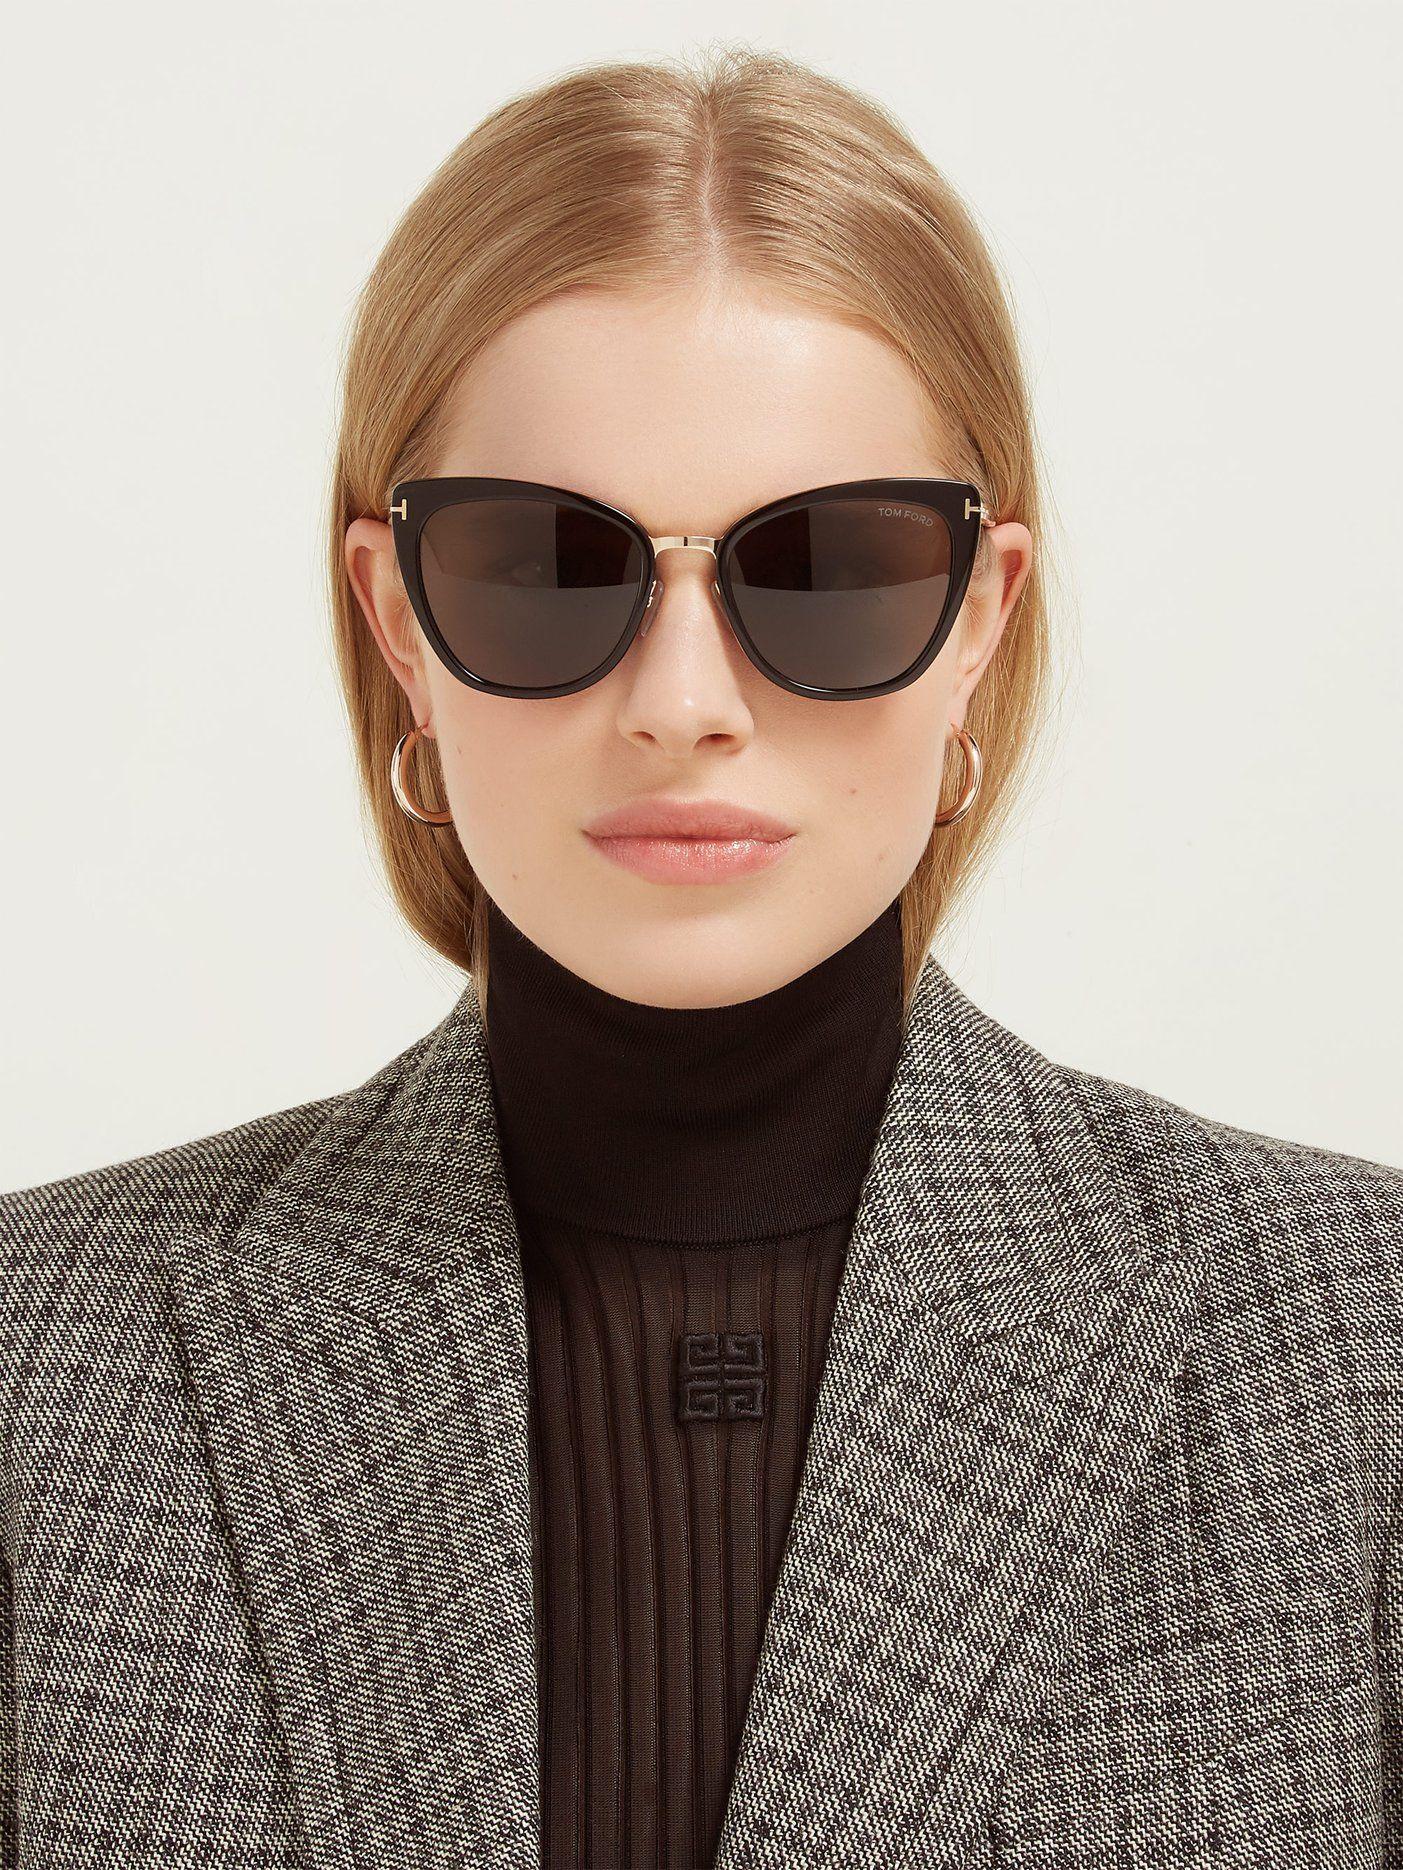 Black Small Thin Narrow Slim Petite Skinny Sunglasses Cat Eye Celeb Style Trend